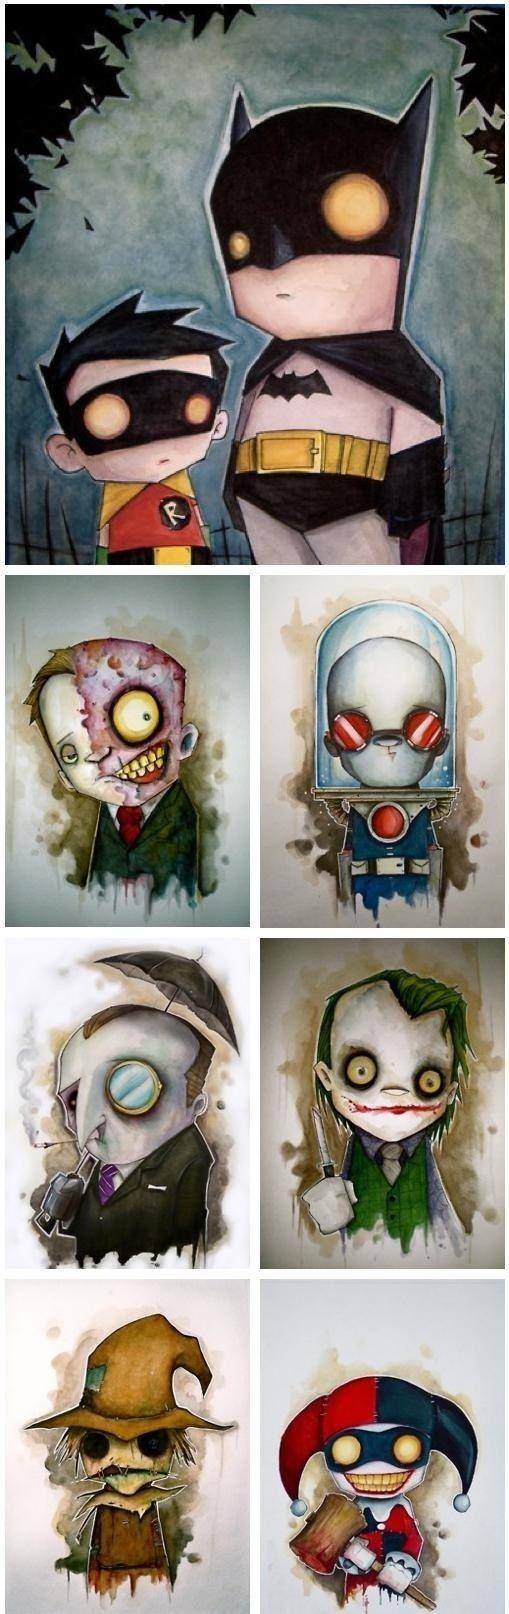 Tim Burton Batman Personajes